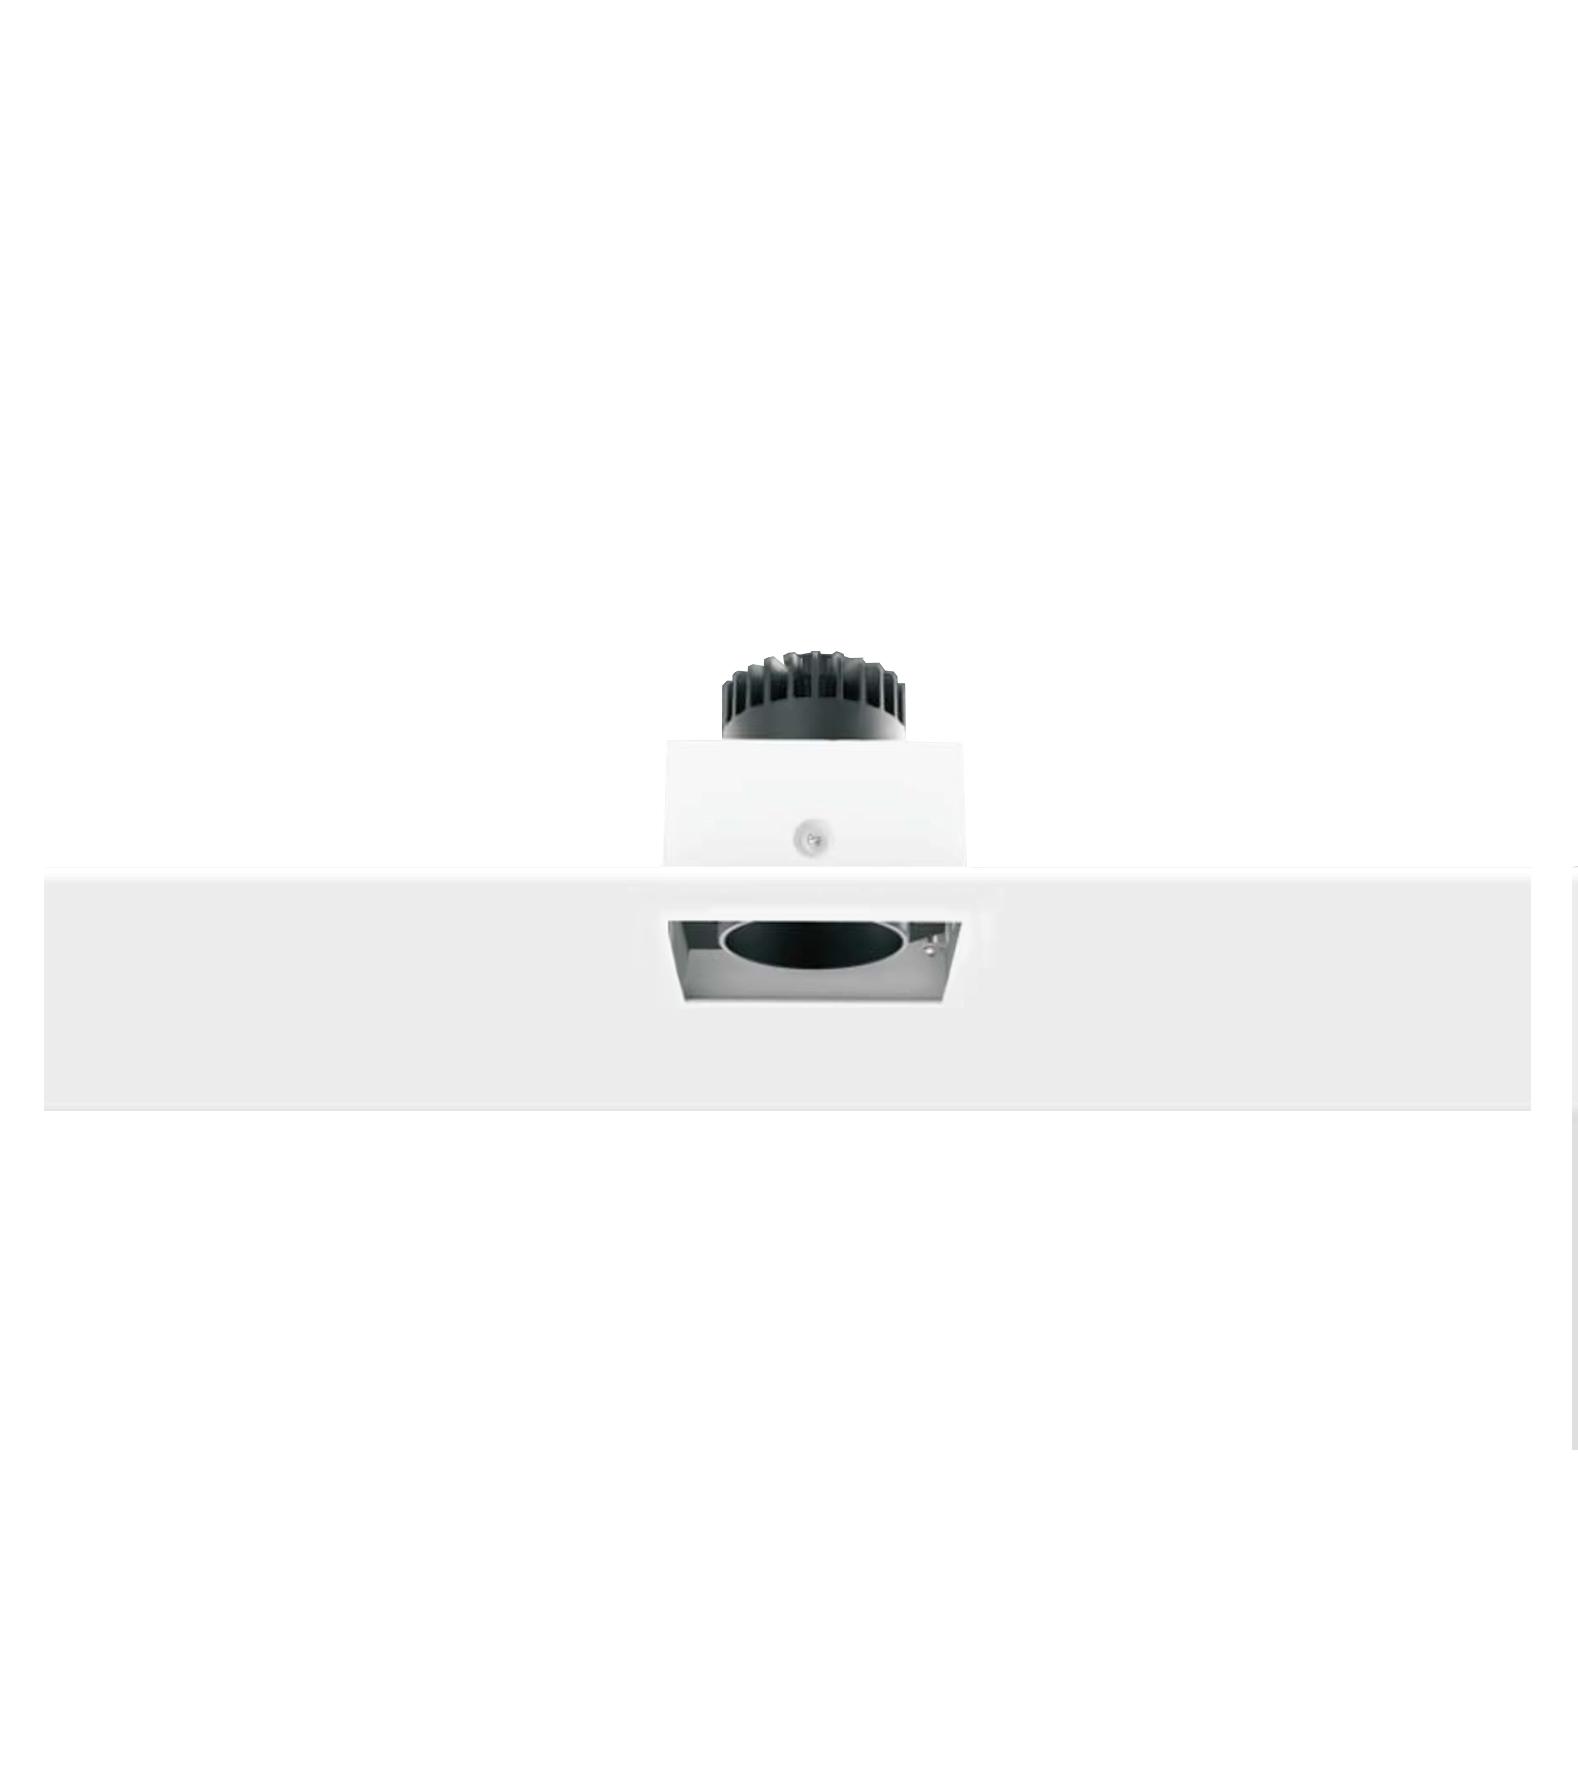 GRILLE LIGHT INDOOR BL03 – unitech.lighting